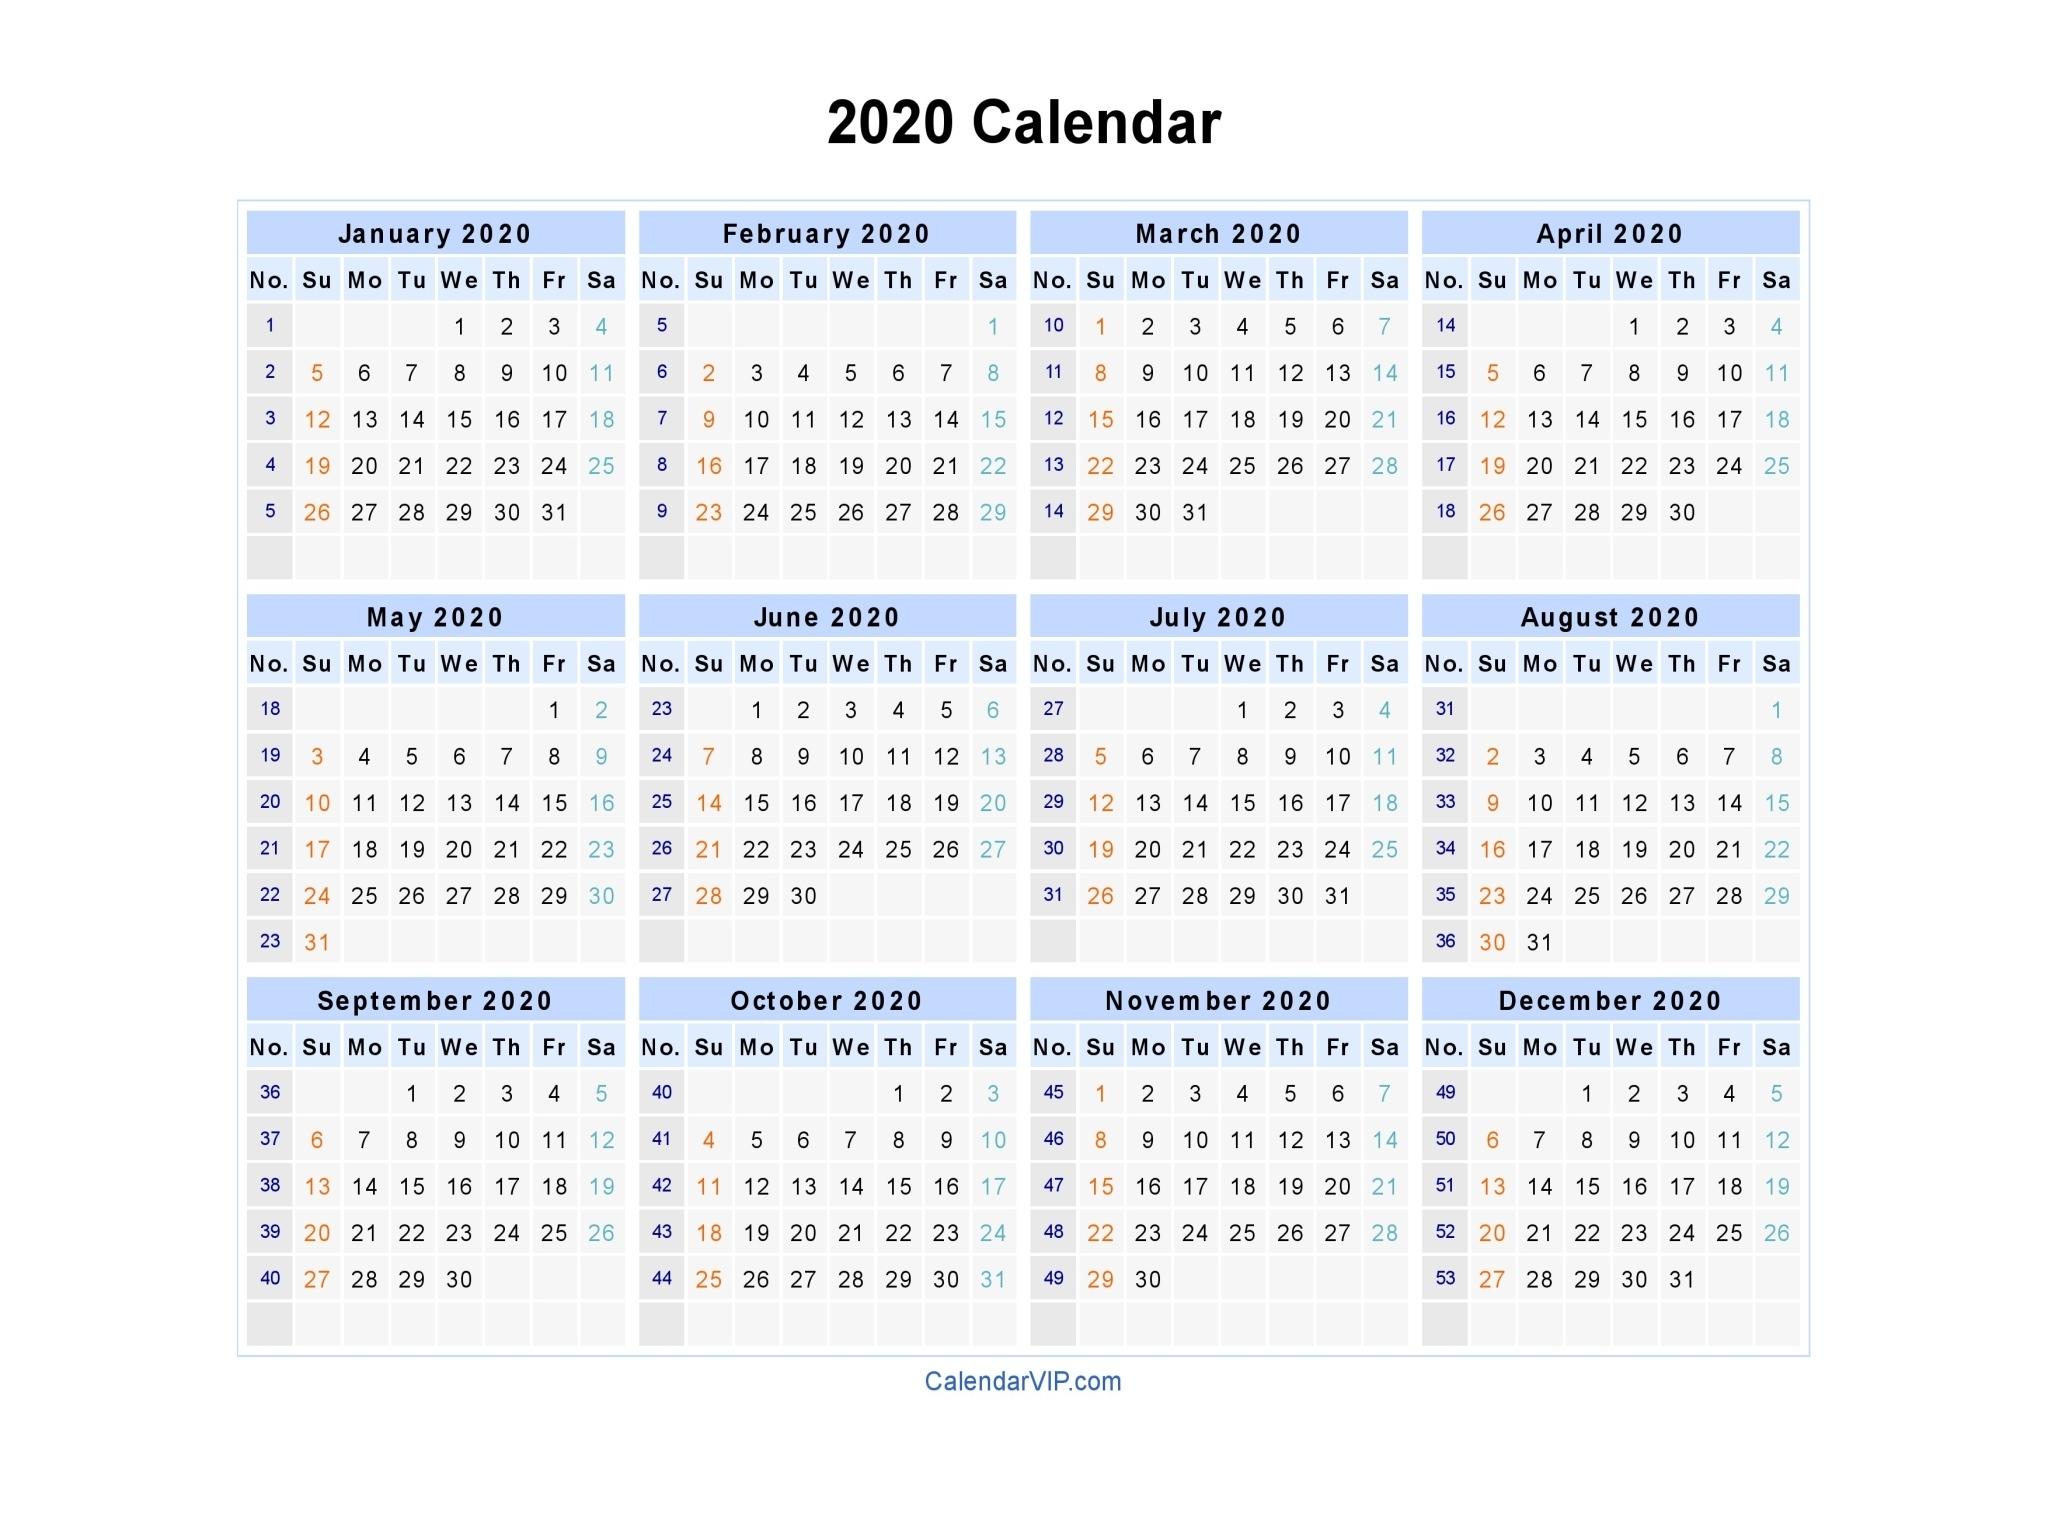 2020 Calendar - Blank Printable Calendar Template In Pdf Word Excel 2020 Calendar Microsoft Word